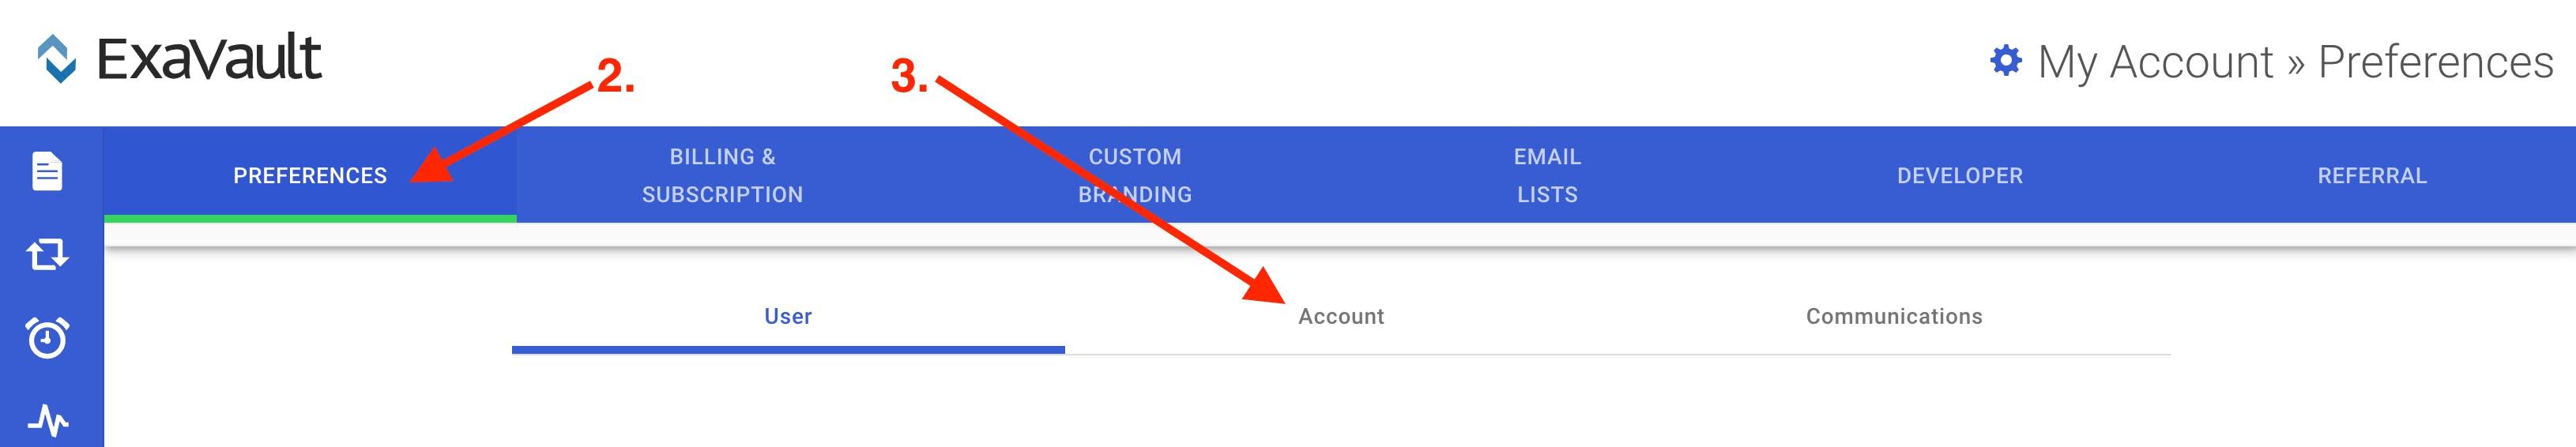 Navigate to account preferences portal.